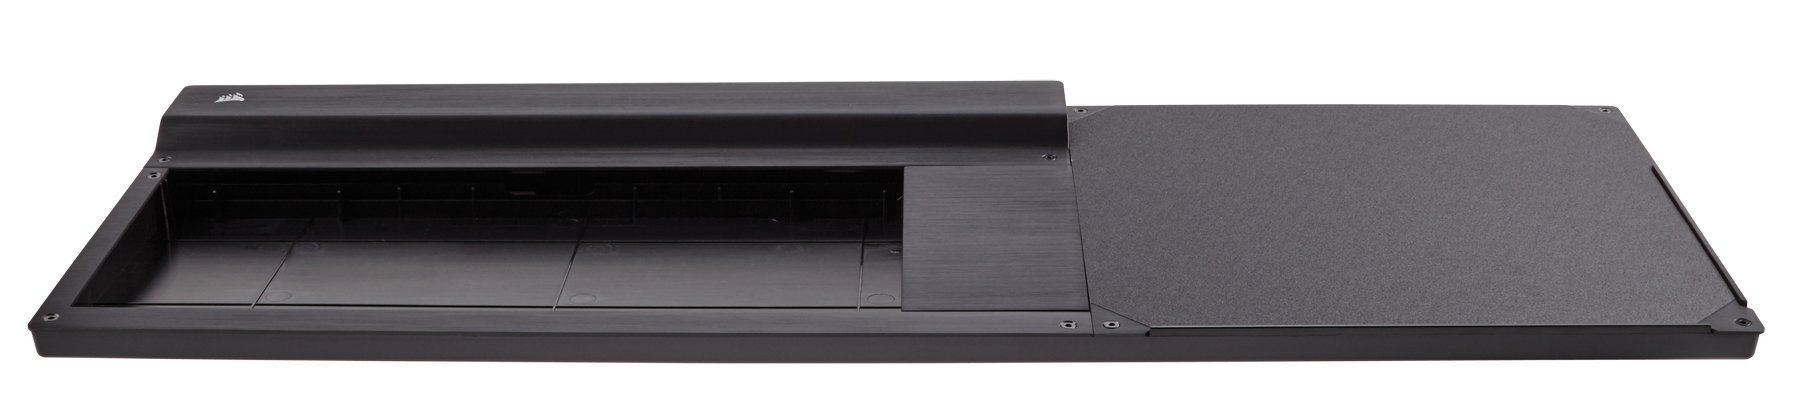 Corsair LAPDOG - Gaming Control Center (CH-9500000-NA)